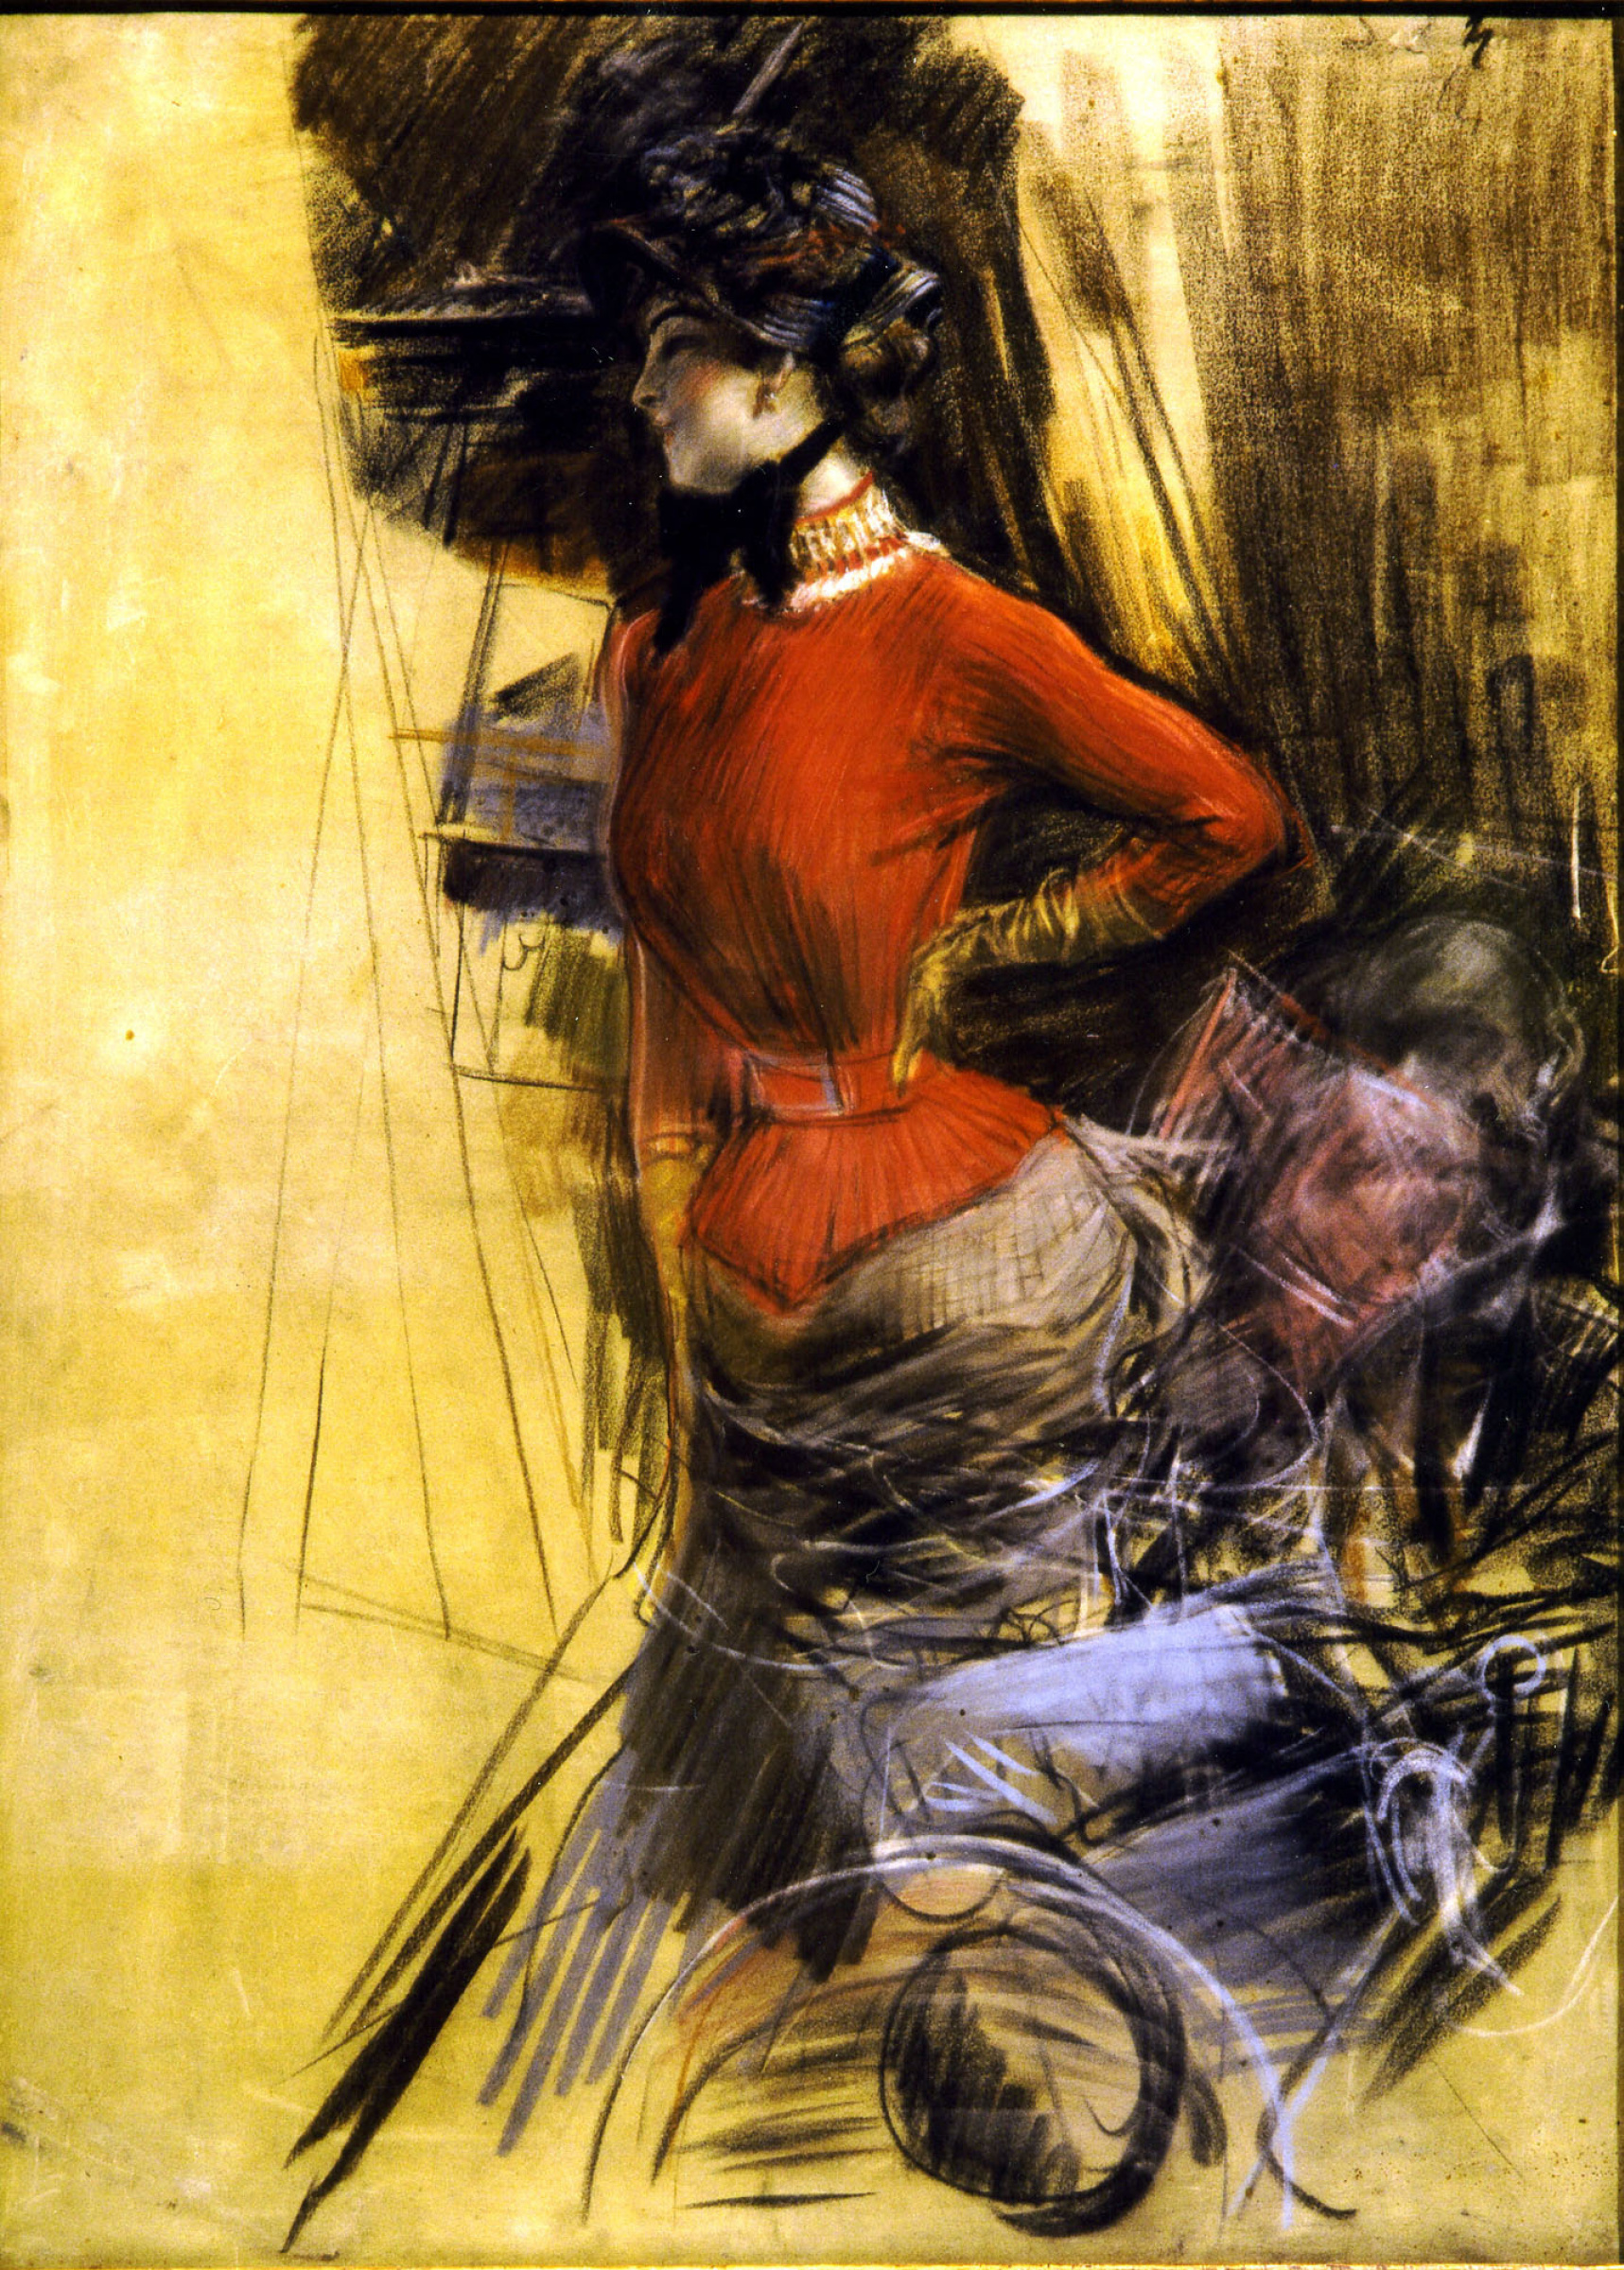 Джованни Больдини. Signora in casacca rossa